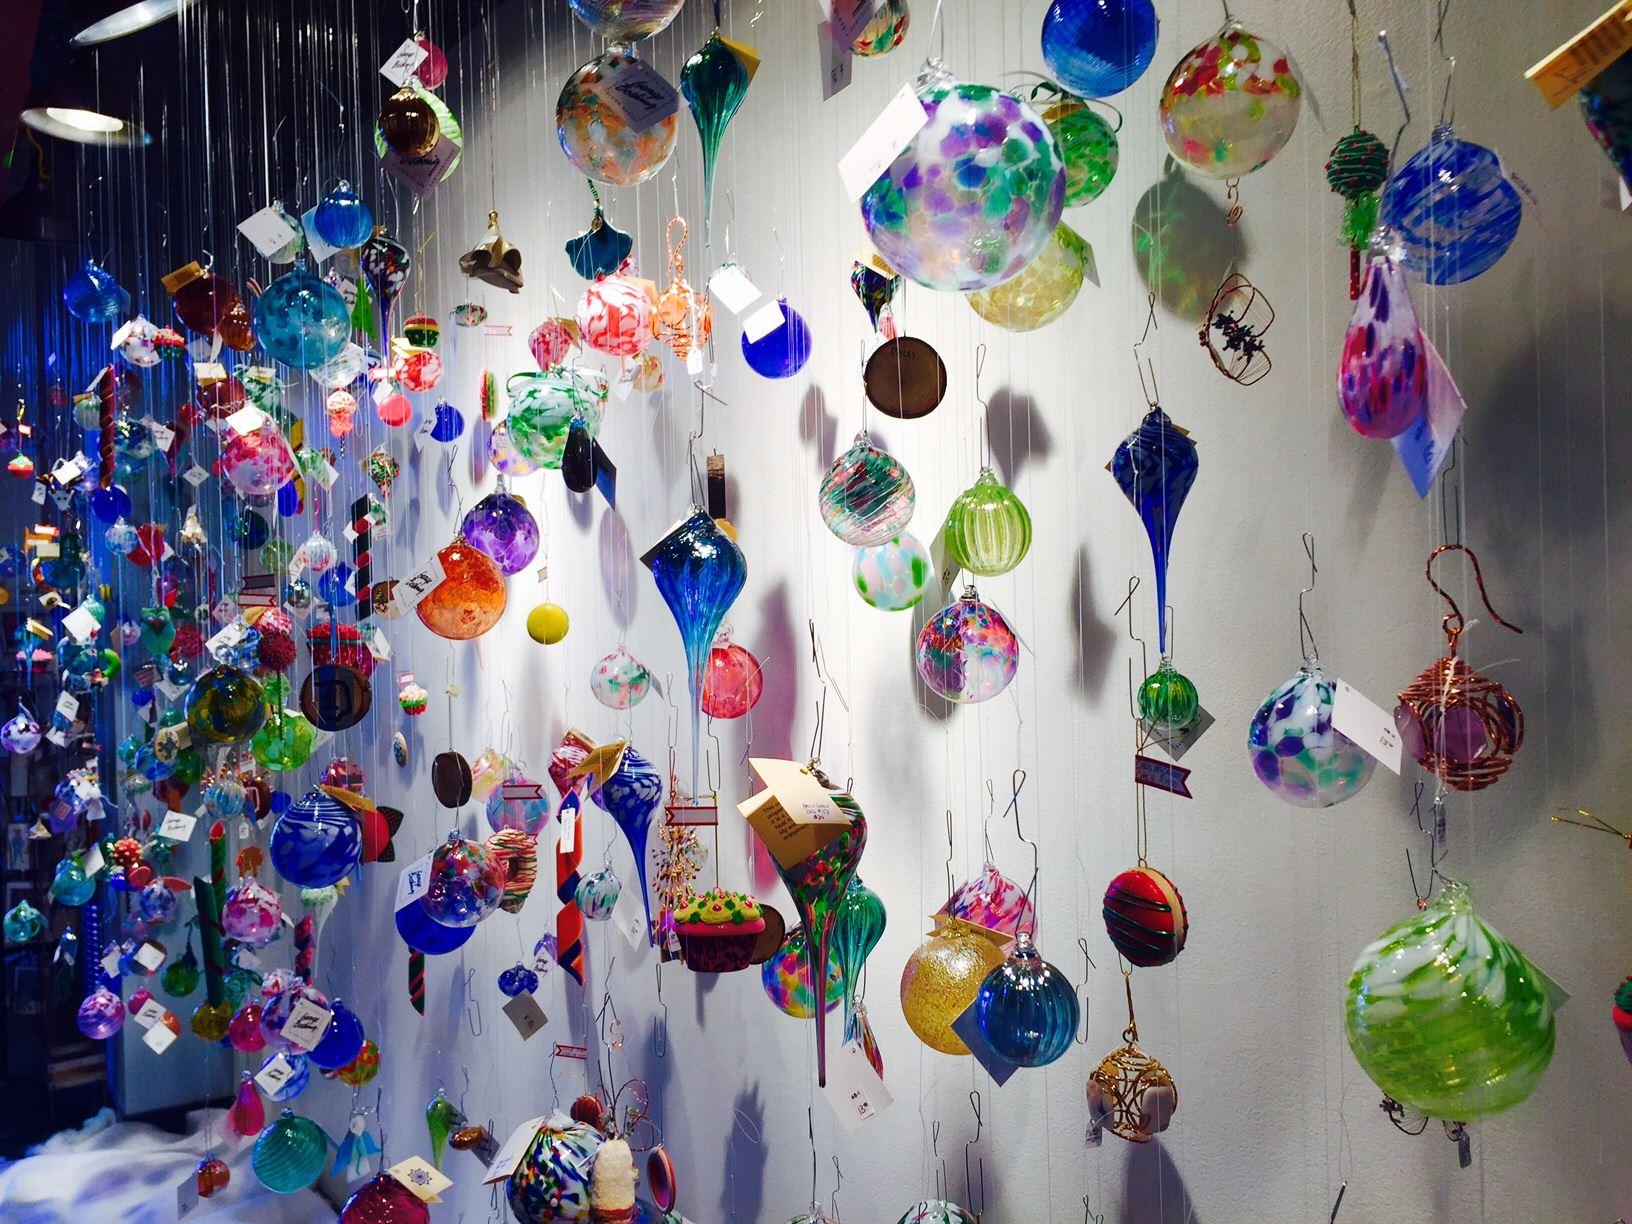 dams-magical-ornament-wall